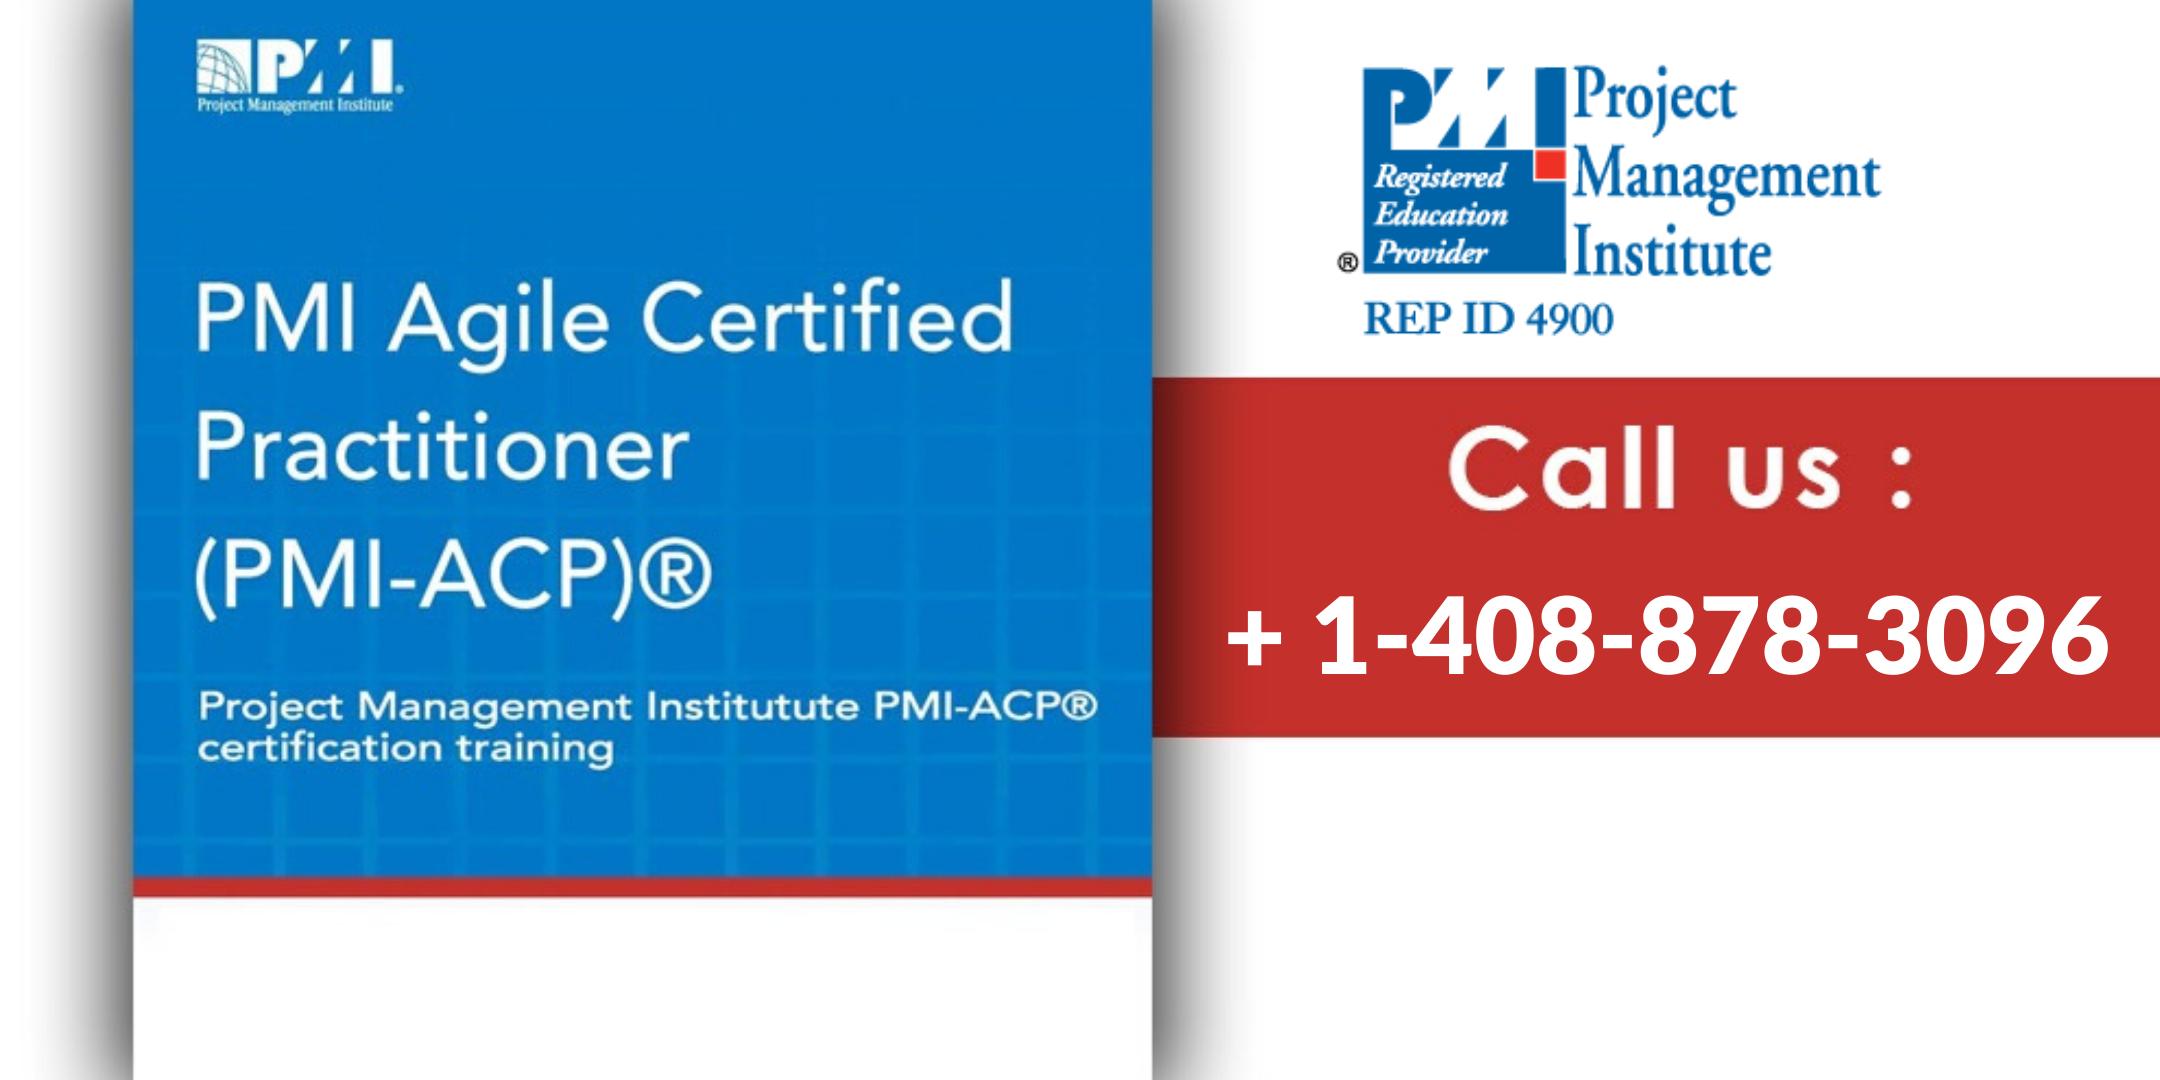 PMI-ACP (PMI Agile Certified Practitioner) Training in Regina